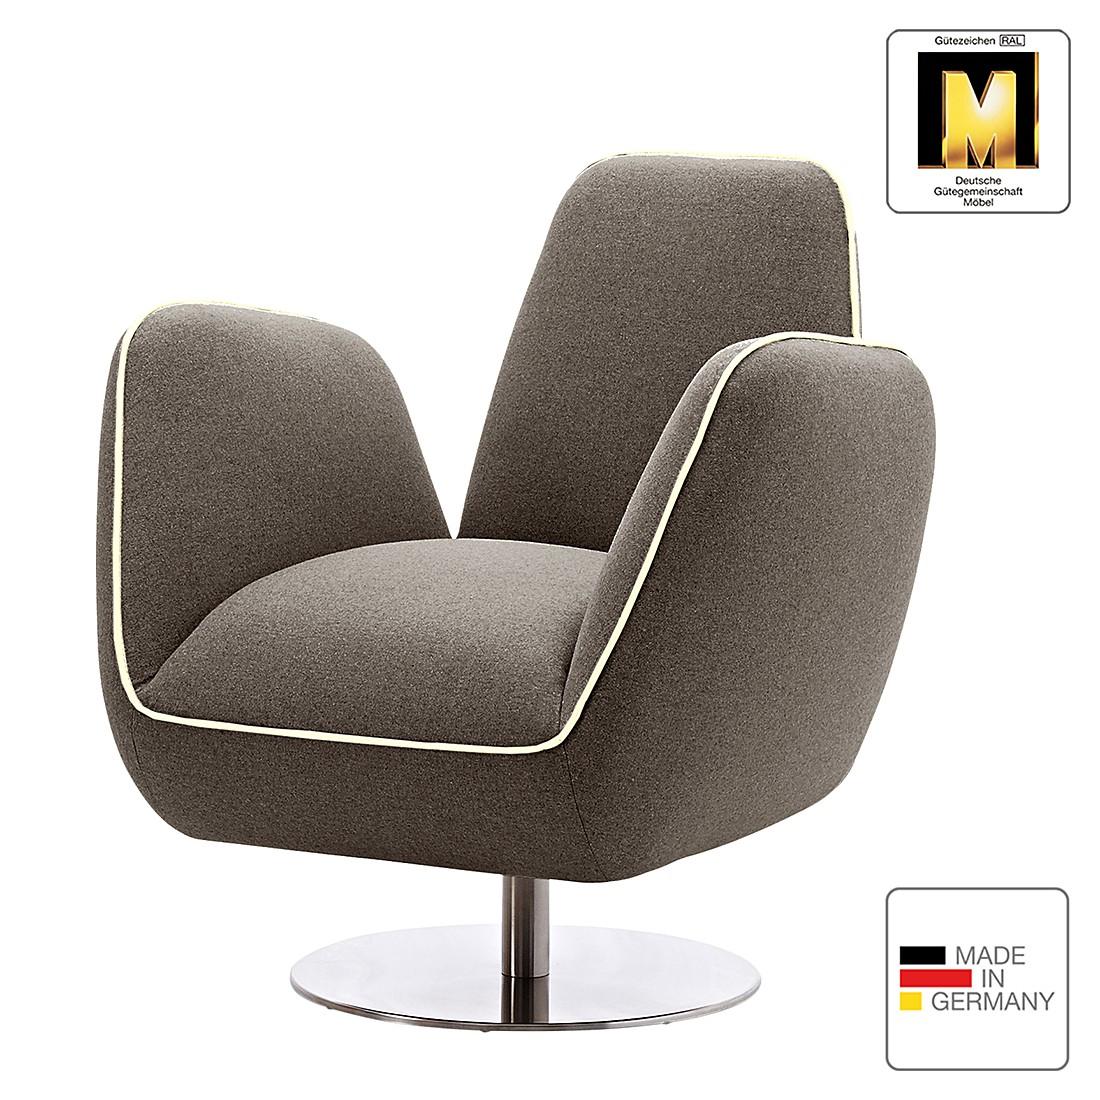 fernsehsessel sitzh he 55 cm bestseller shop f r m bel und einrichtungen. Black Bedroom Furniture Sets. Home Design Ideas